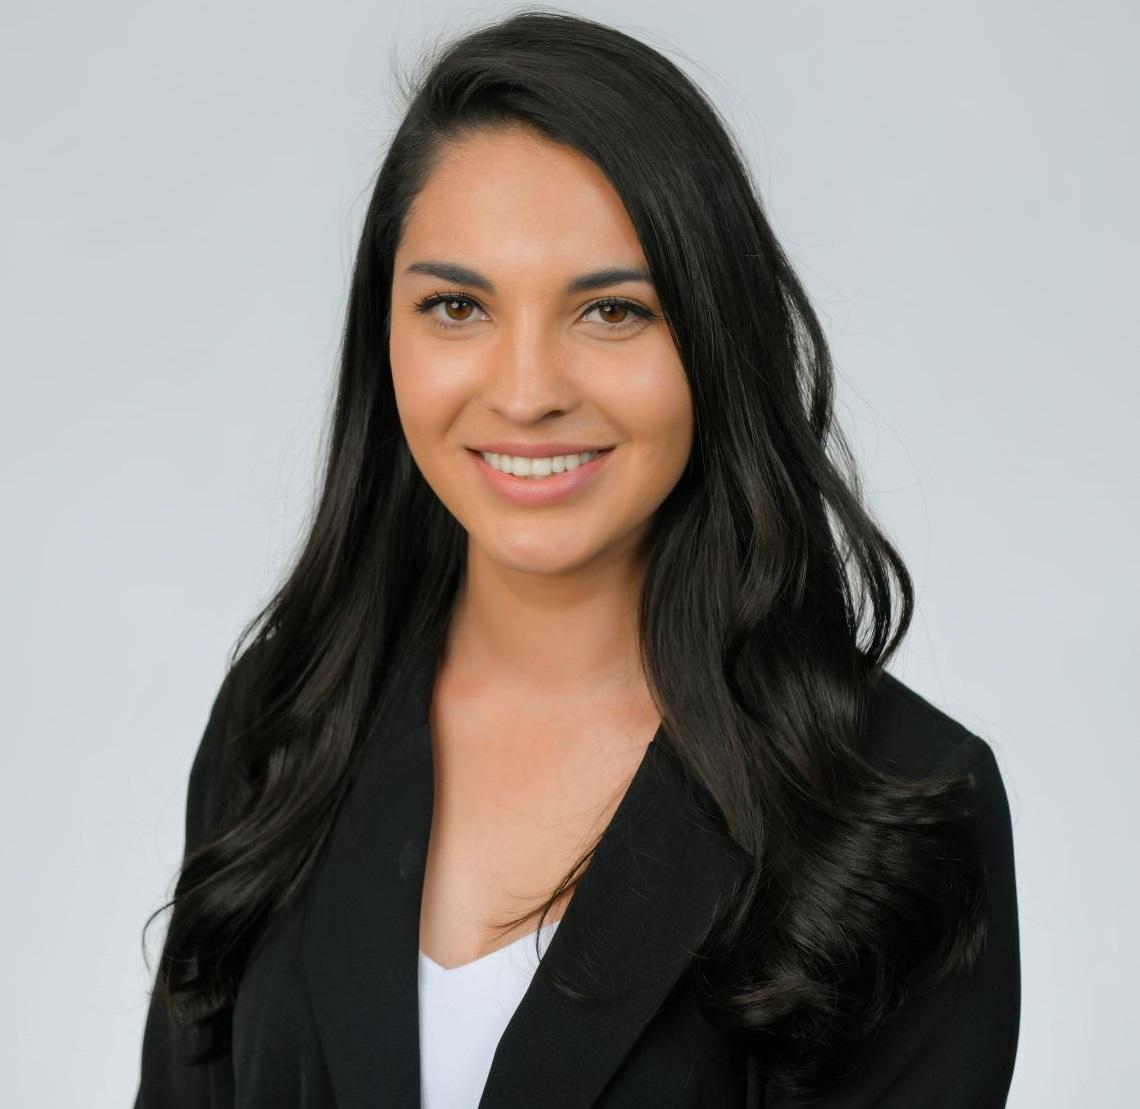 Laura Gallegos